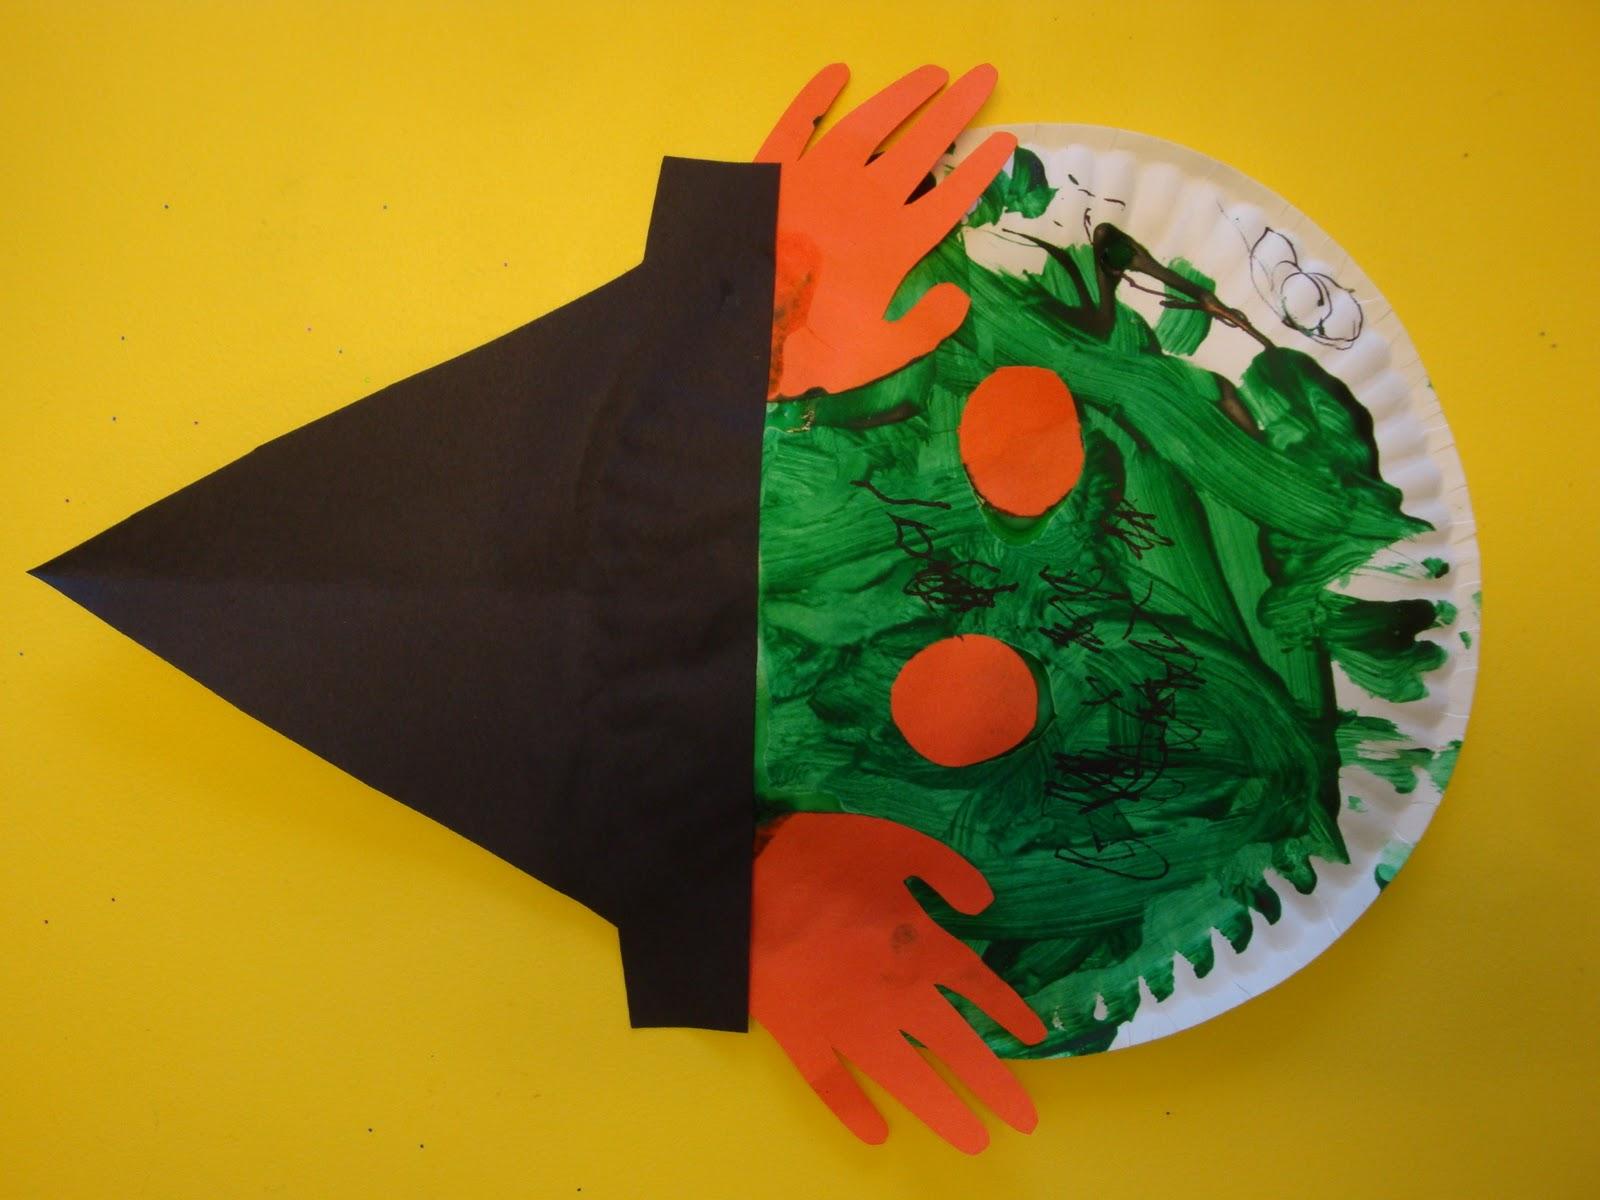 Nicci S Little Angels Arts Amp Craft Projects Halloween Ideas